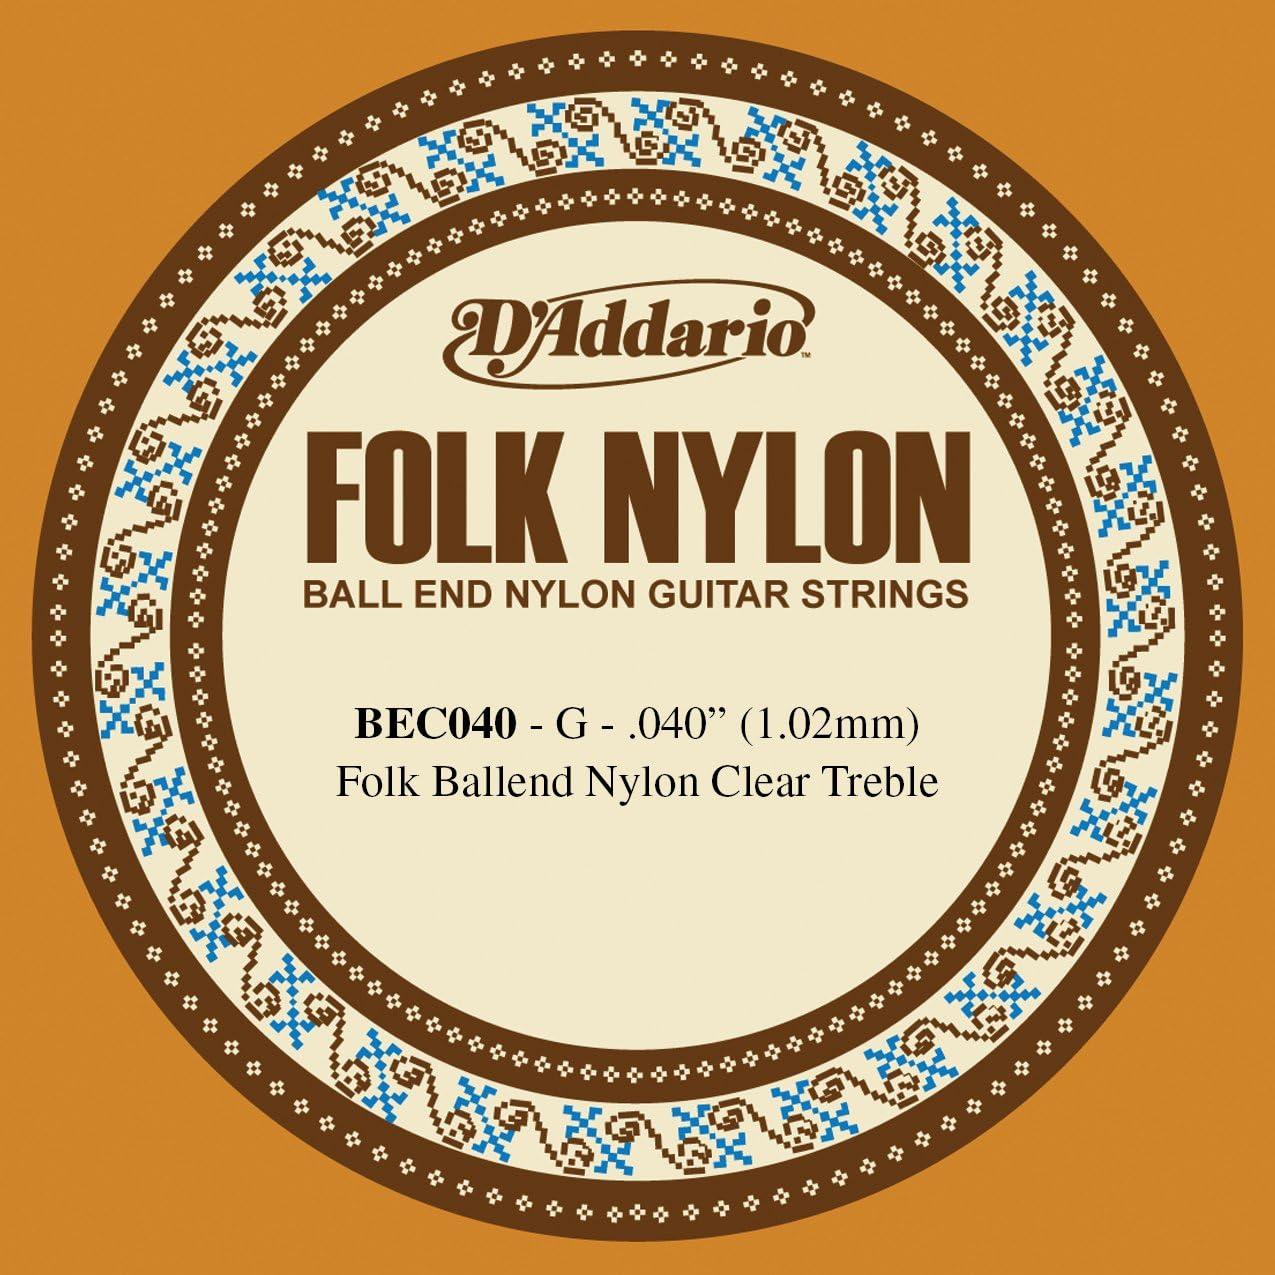 D'Addario BEC040 - Cuerda para guitarra de nylon, 040, extremo de bola